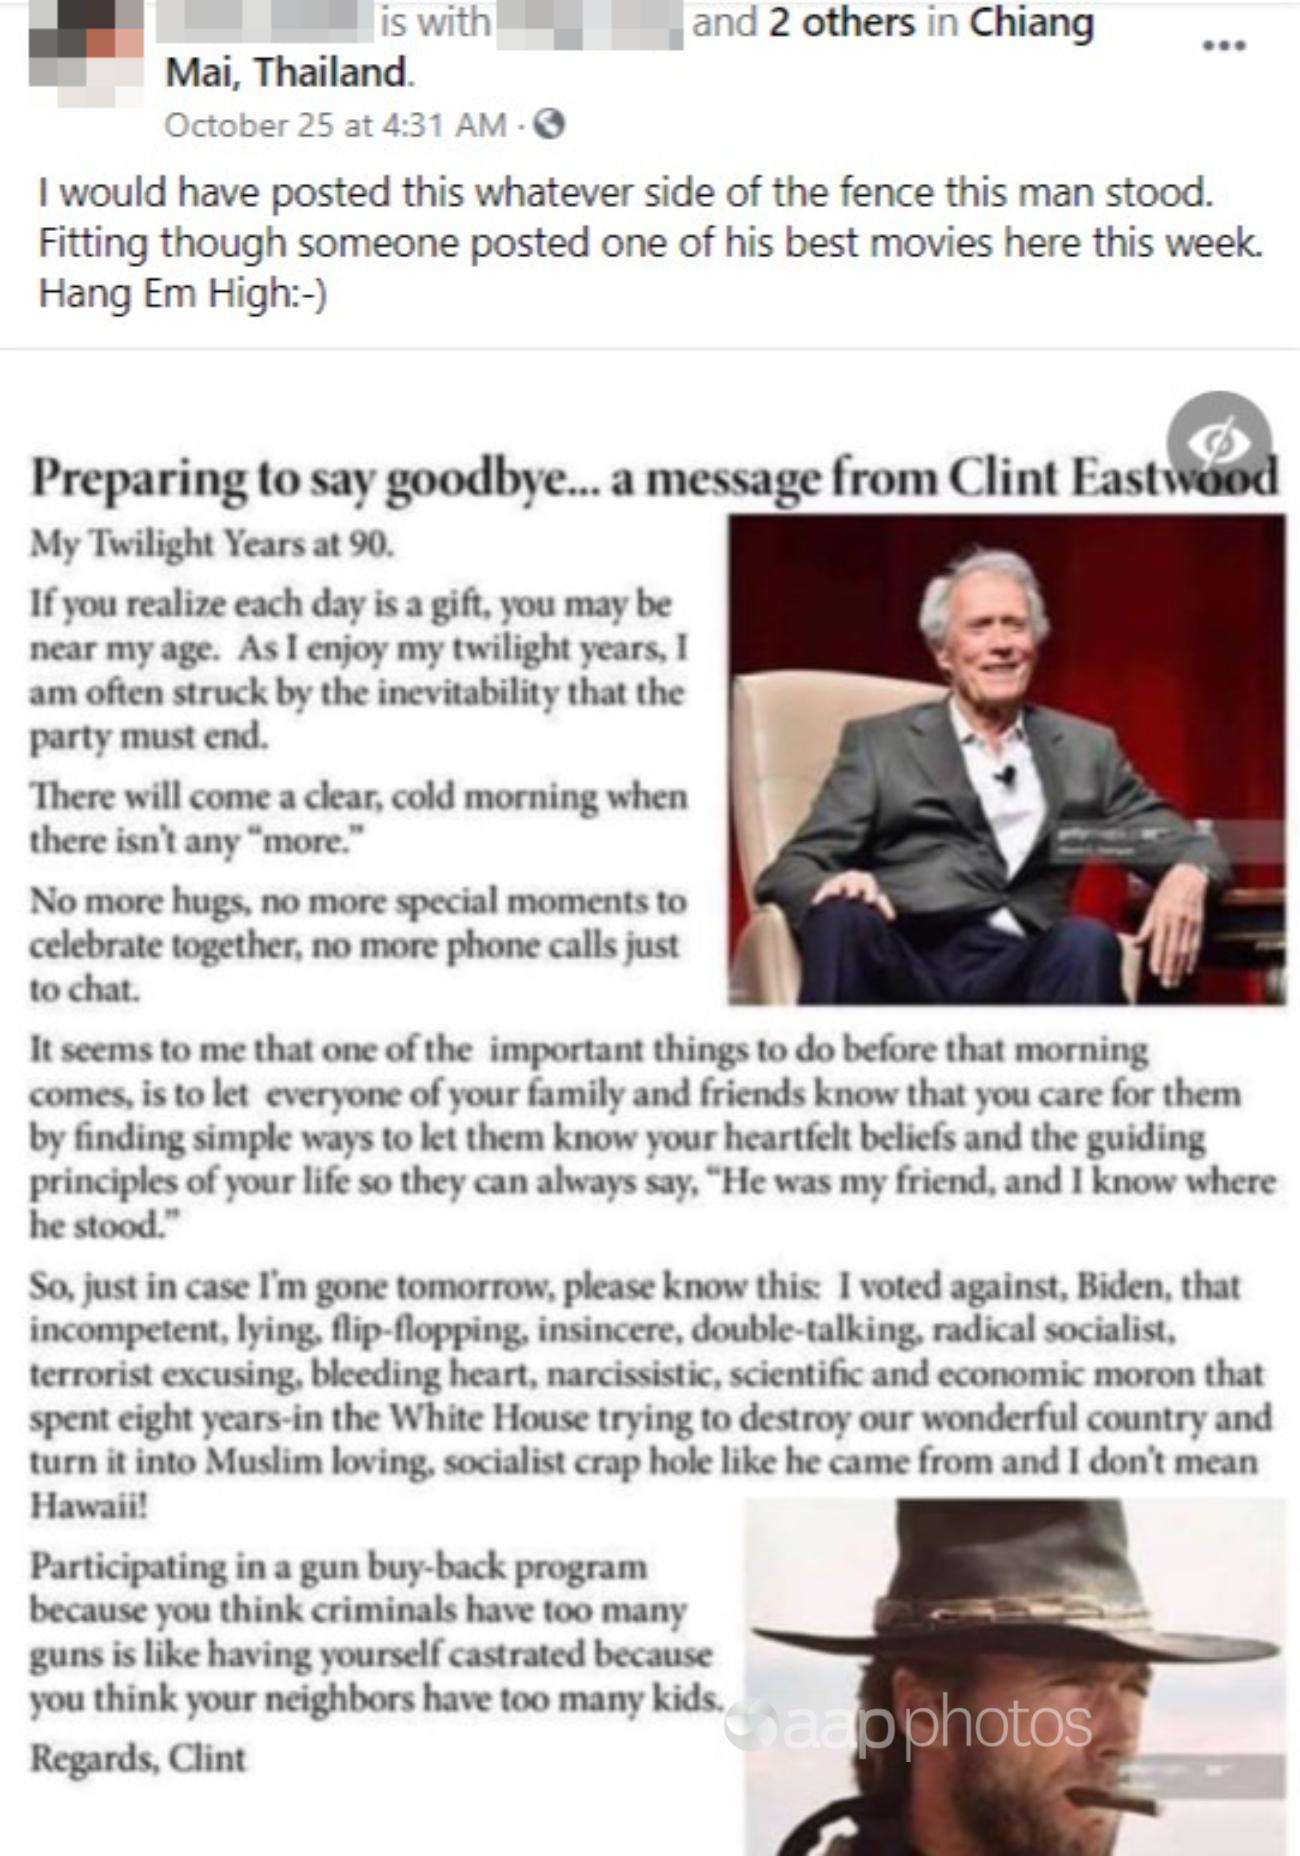 Clint Eastwood Facebook post